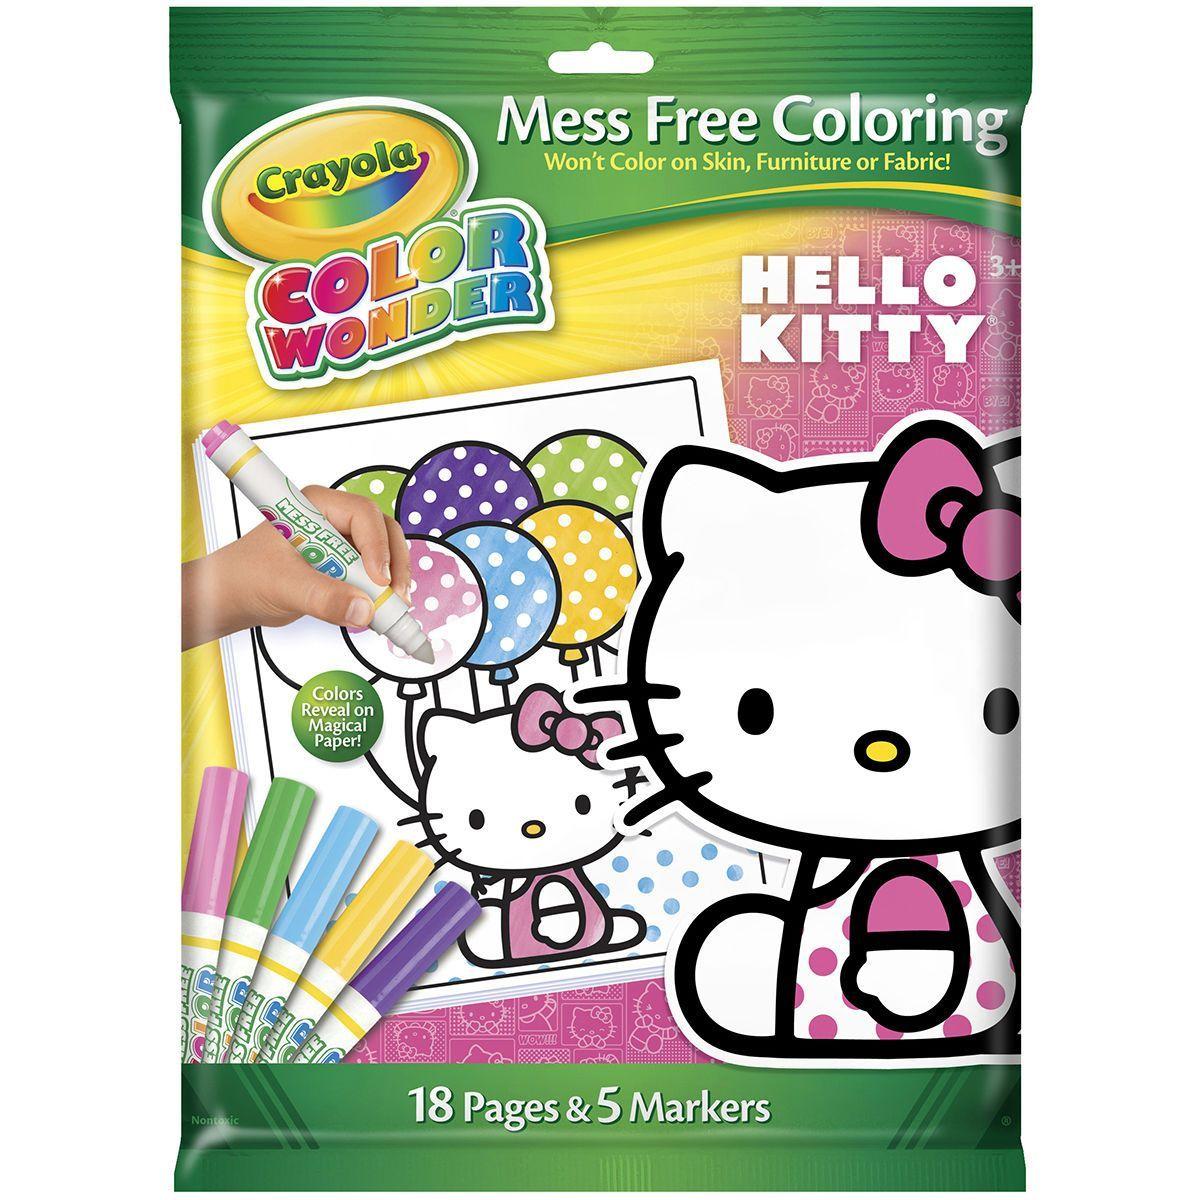 Crayola Color Wonder Mess Free Coloring Kit Hello Kitty Jo Ann Hello Kitty Coloring Color Wonder Hello Kitty Themes